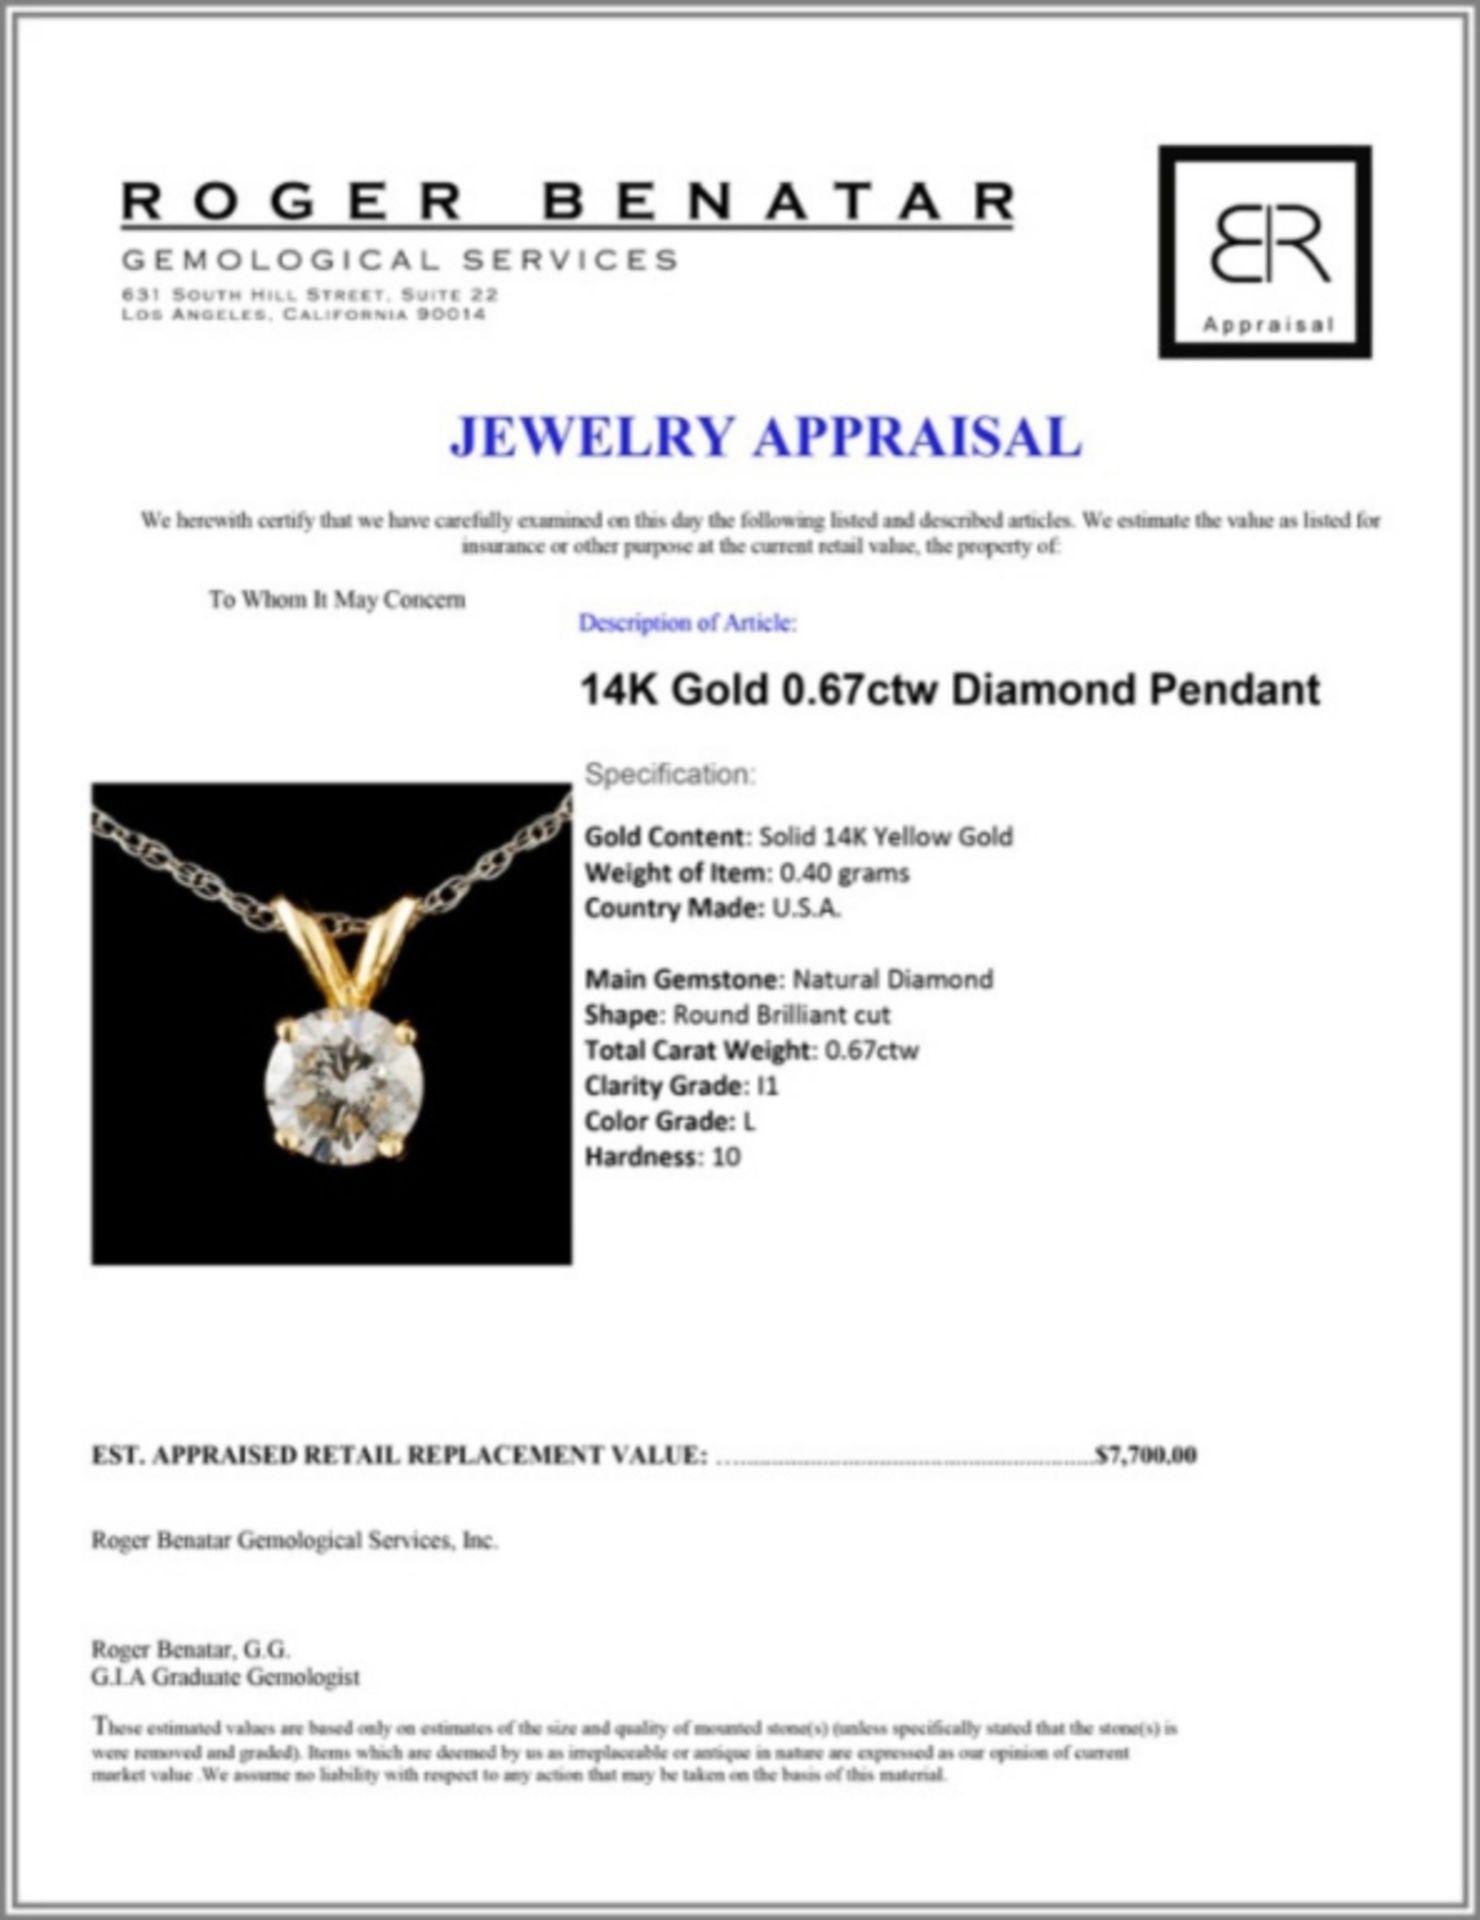 14K Gold 0.67ctw Diamond Pendant - Image 3 of 3